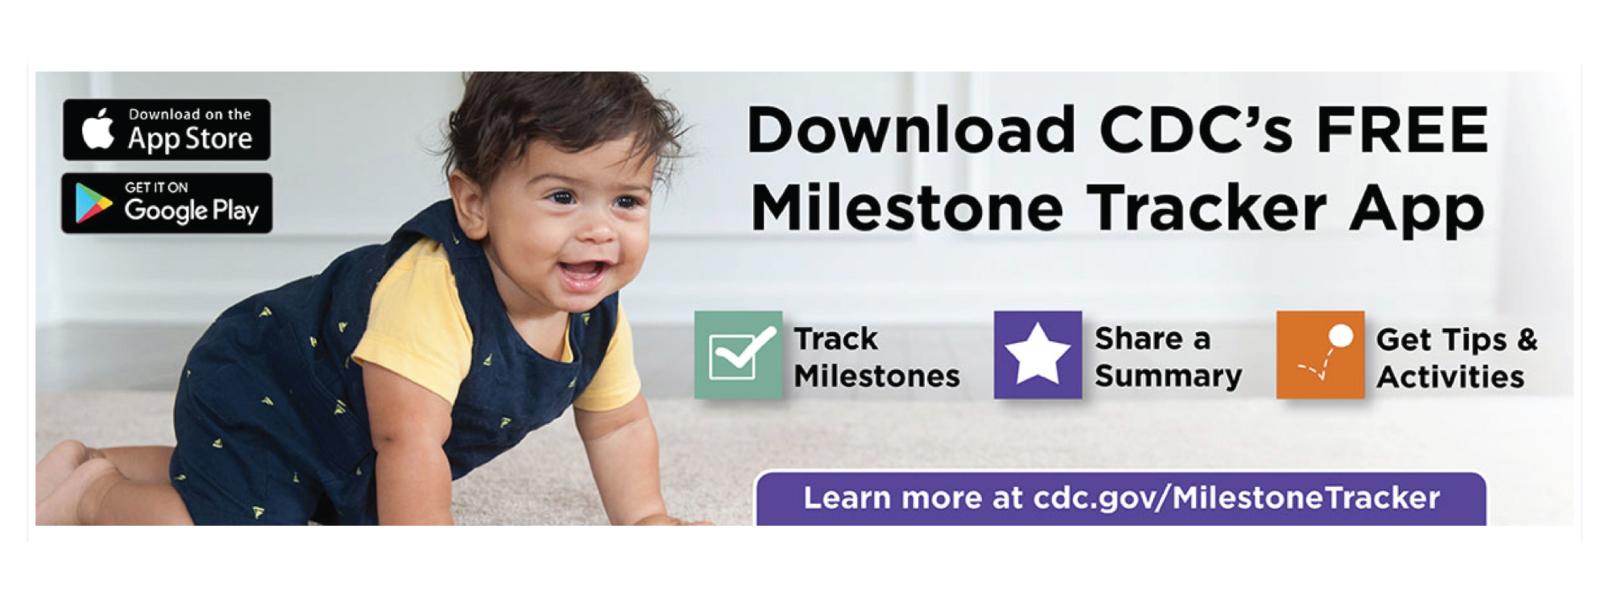 Milestone Tracker App